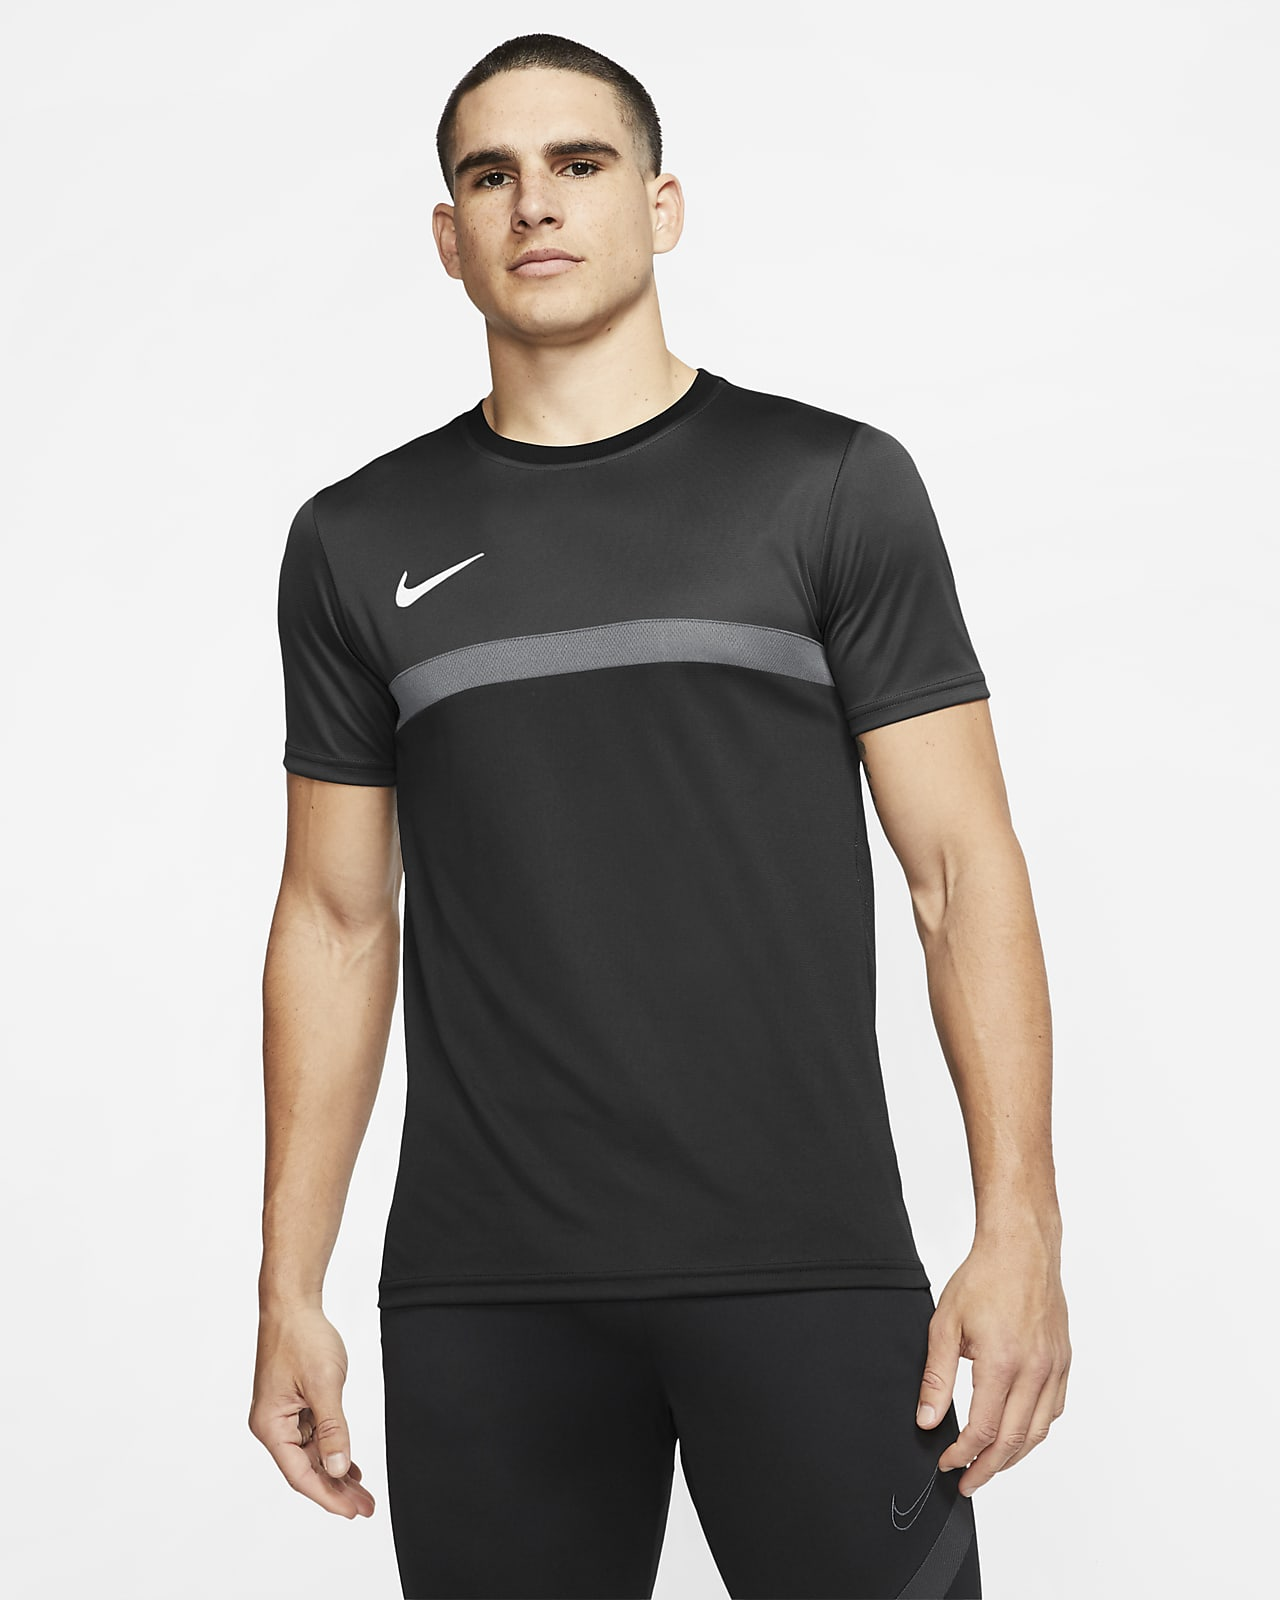 Nike Dri-FIT Academy Pro Men's Short-Sleeve Football Top